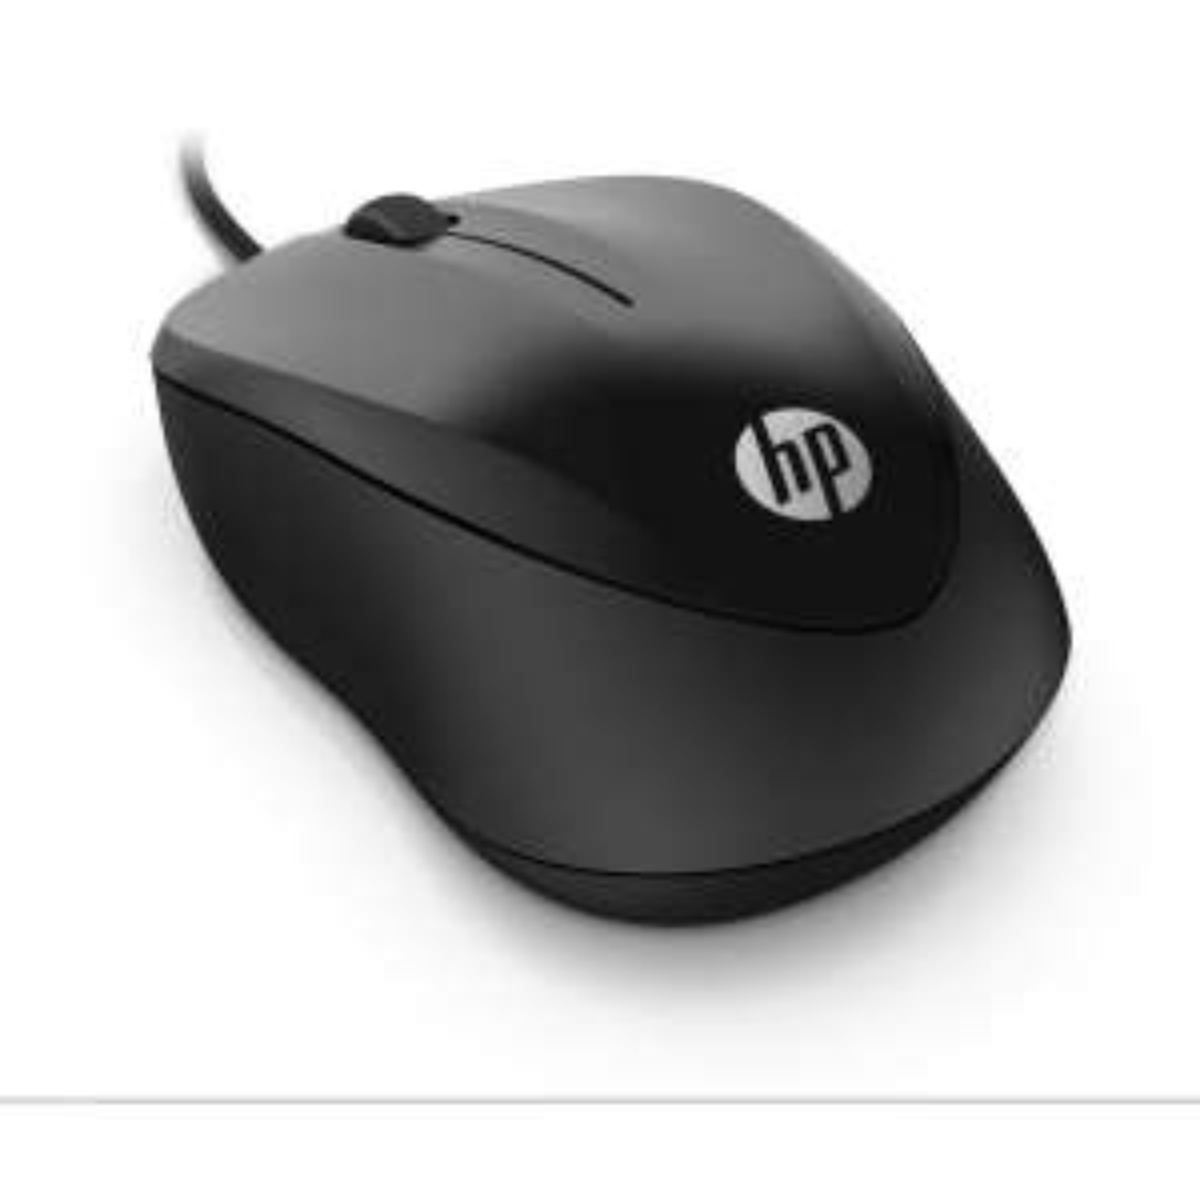 HP 1000 mouse USB ergonomico